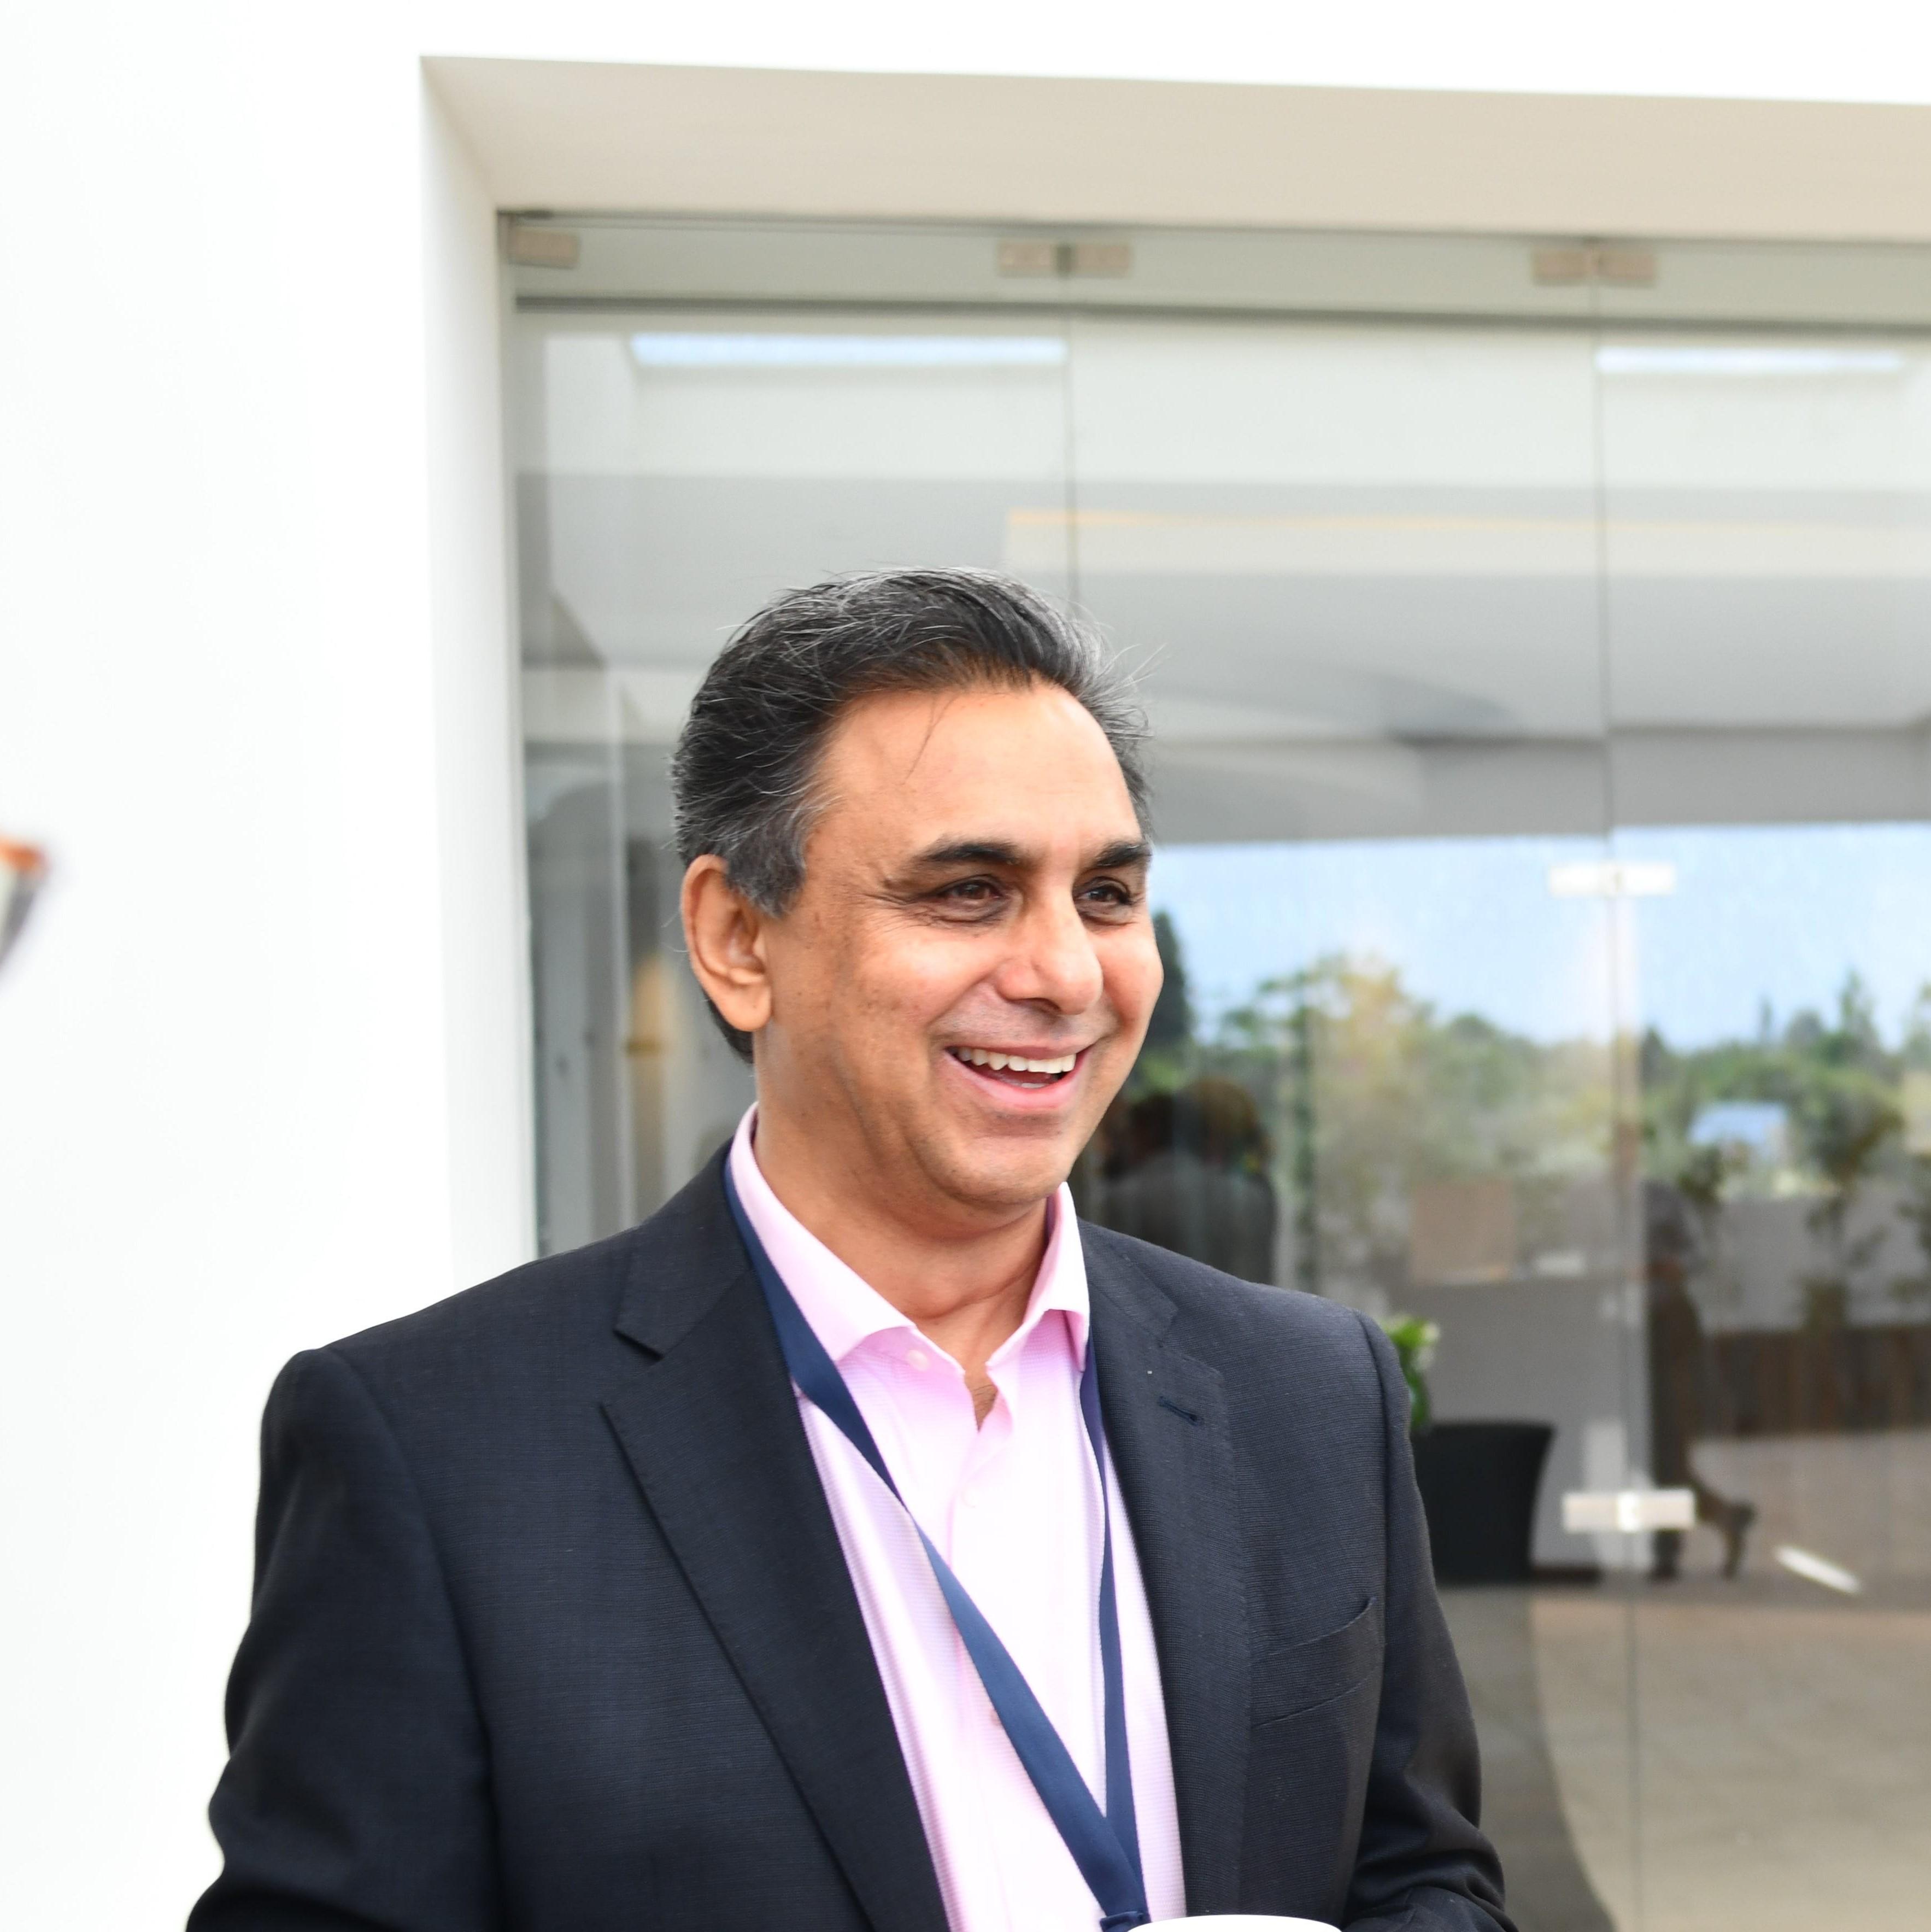 Vinay Sanghrajka